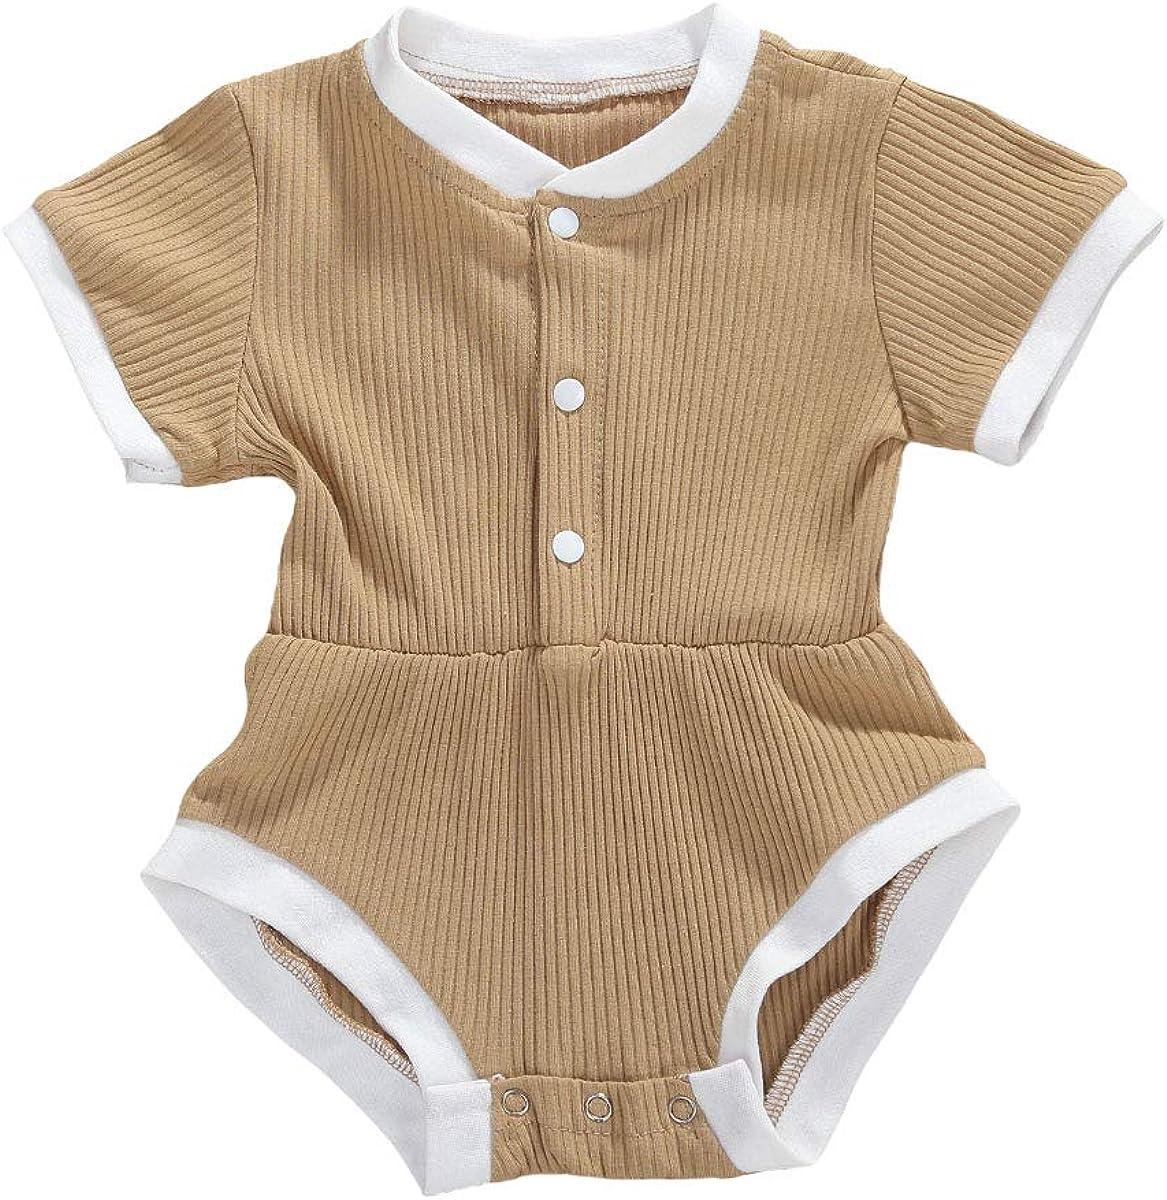 Longfei Newborn Baby Girl Summer Bodysuit Romper Jumpsuit One-Piece Outfits